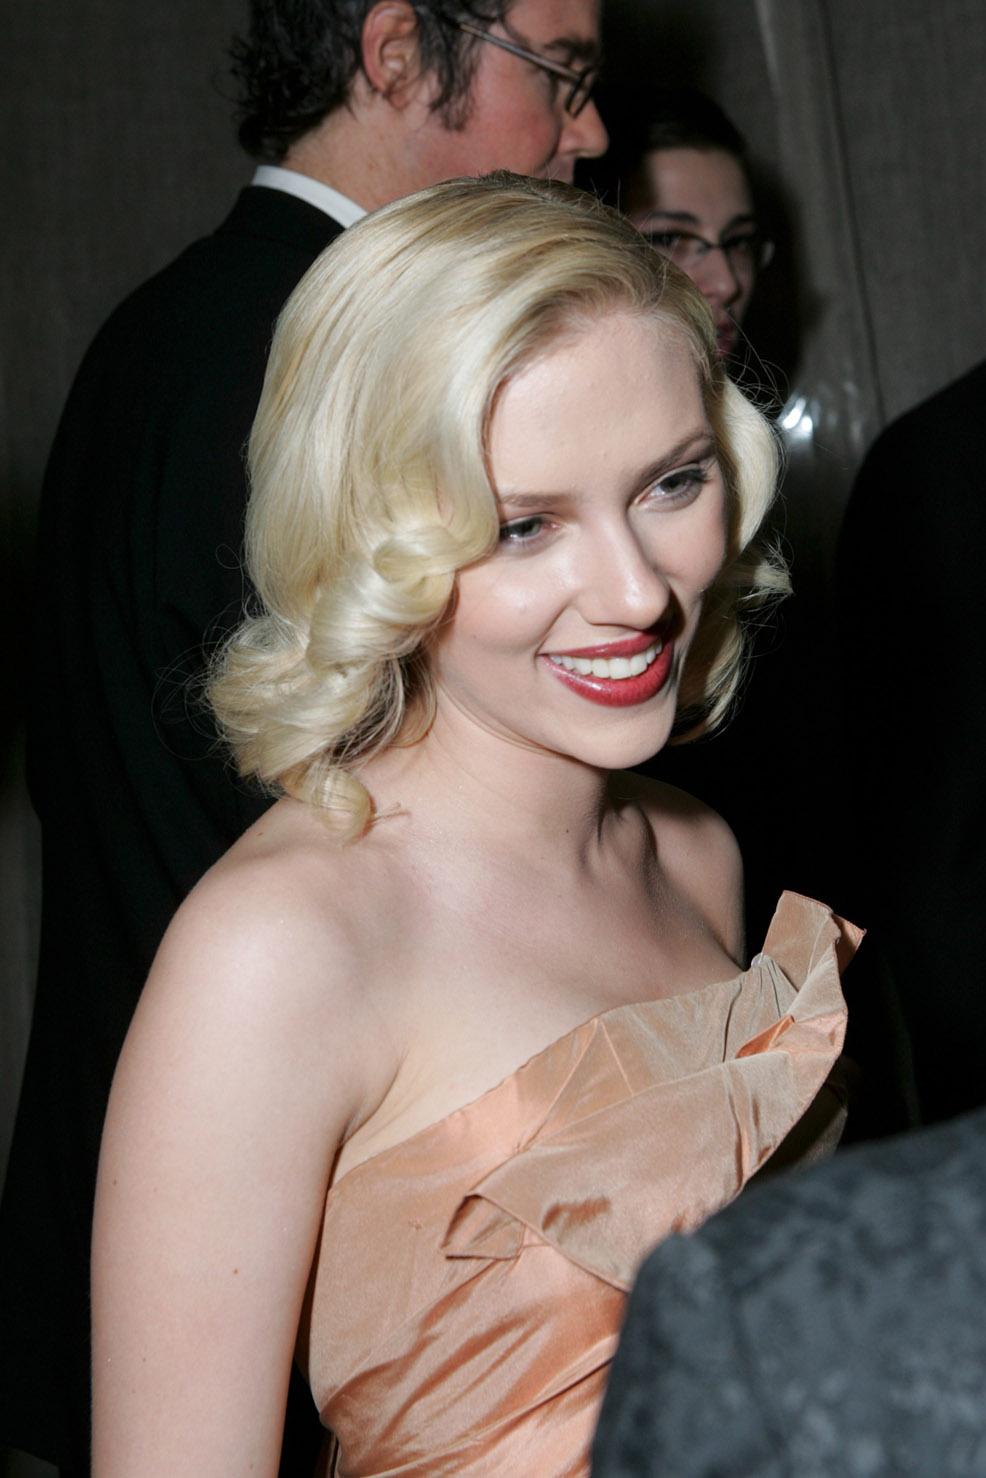 Scarlett johansson pictures gallery 49 film actresses - Scarlett johansson blogspot ...